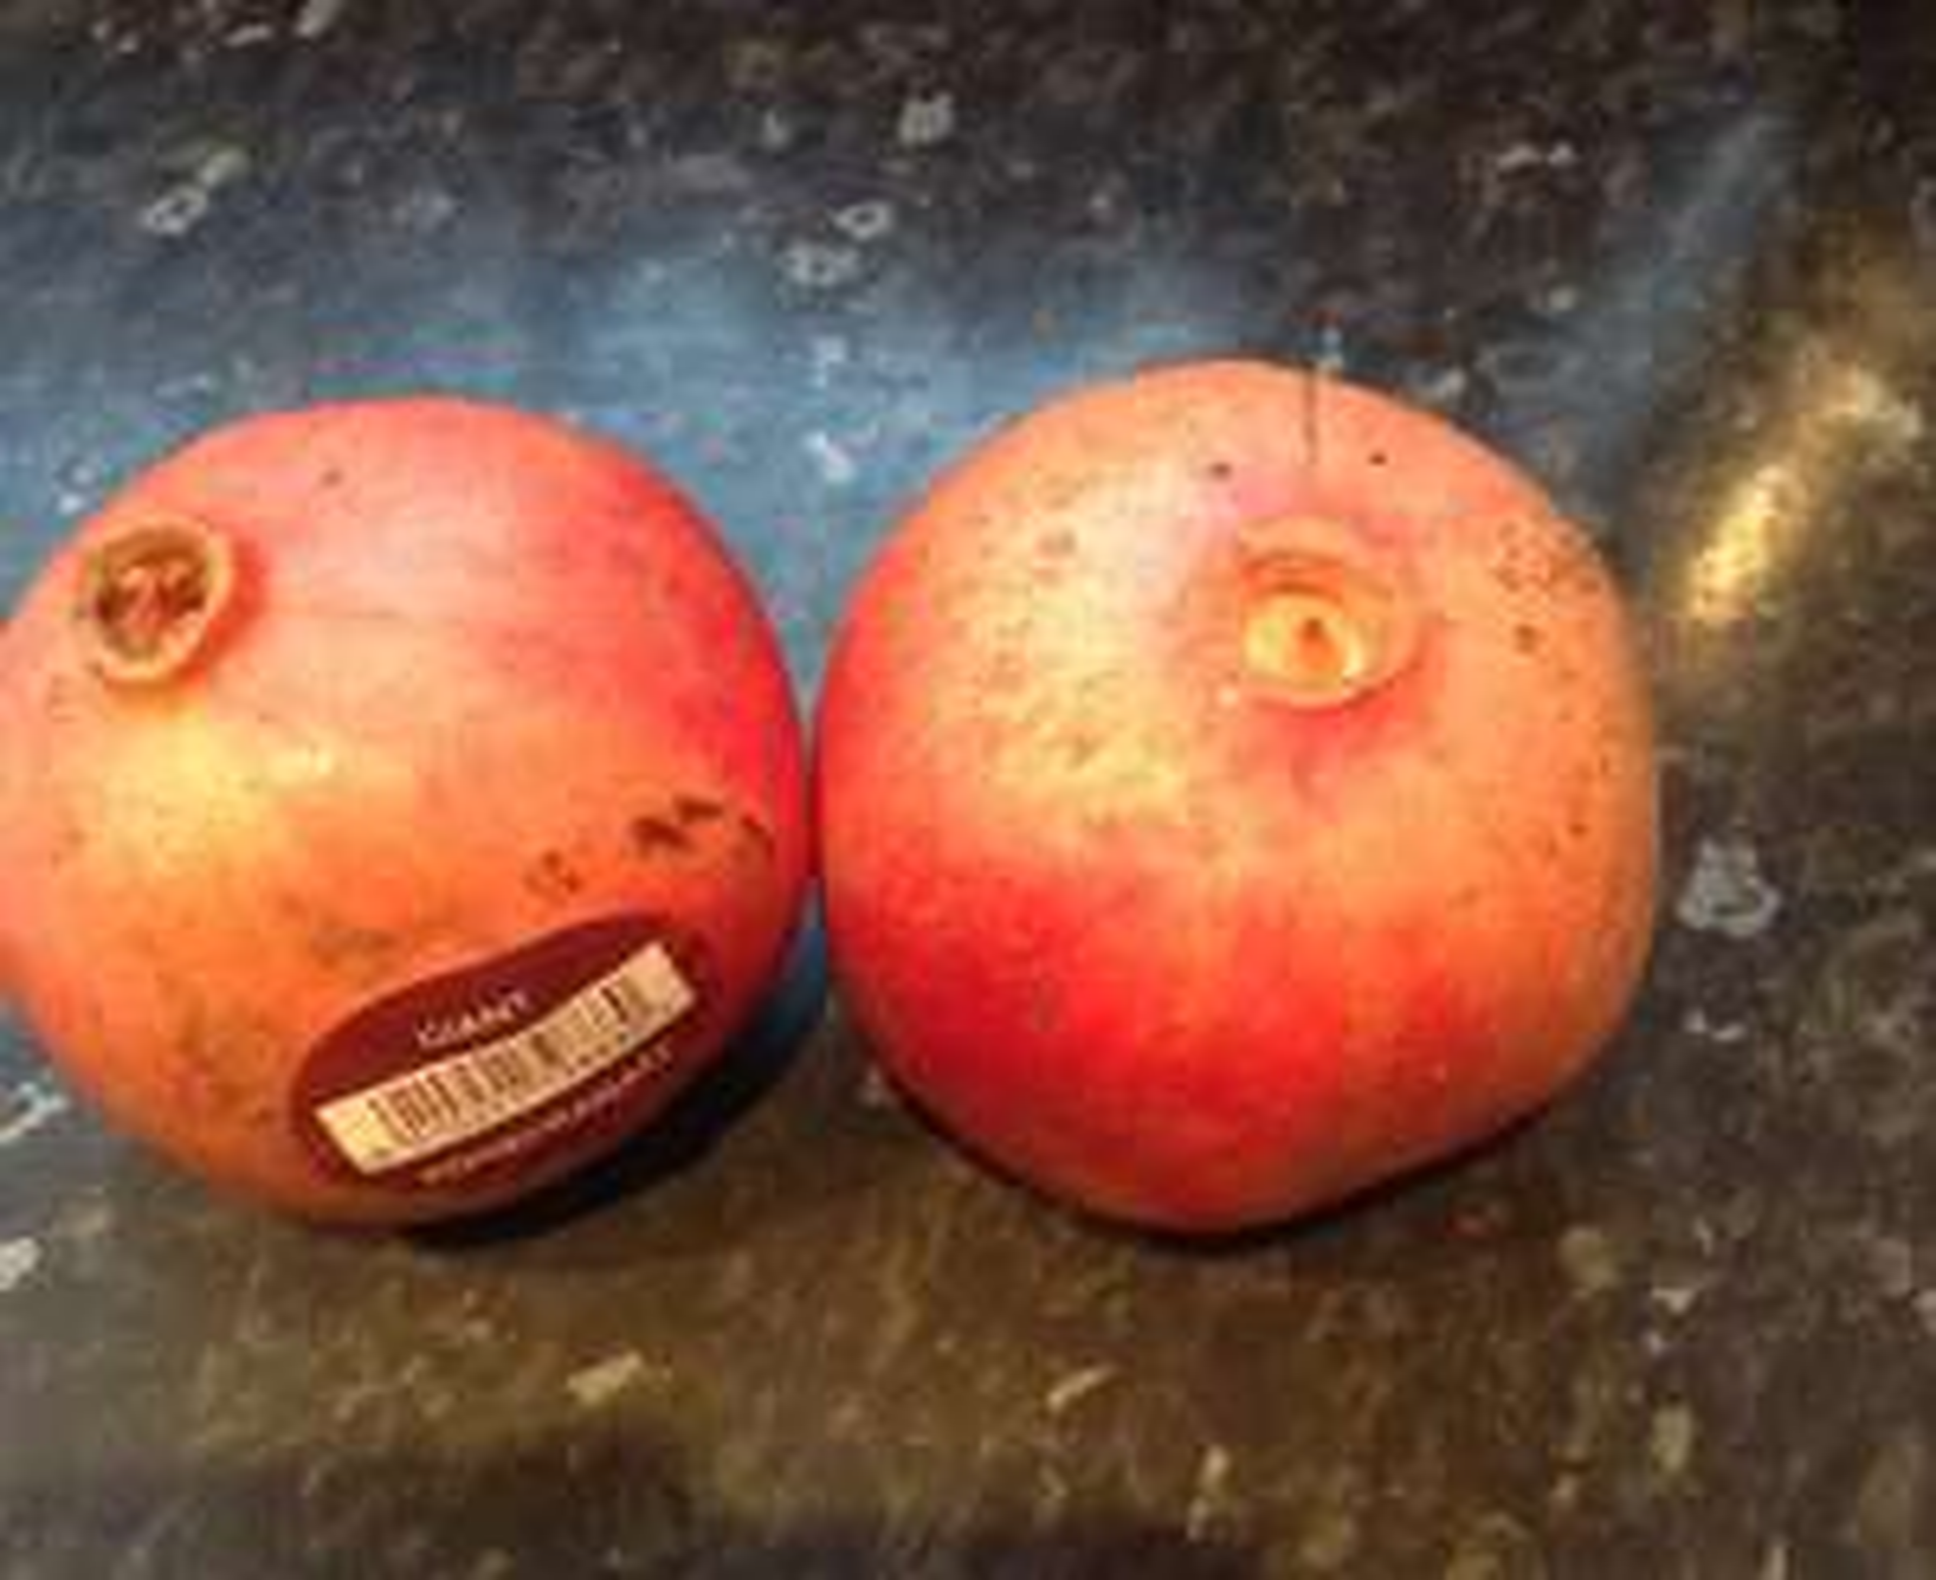 Giant pomegranate 50p @ Morrisons